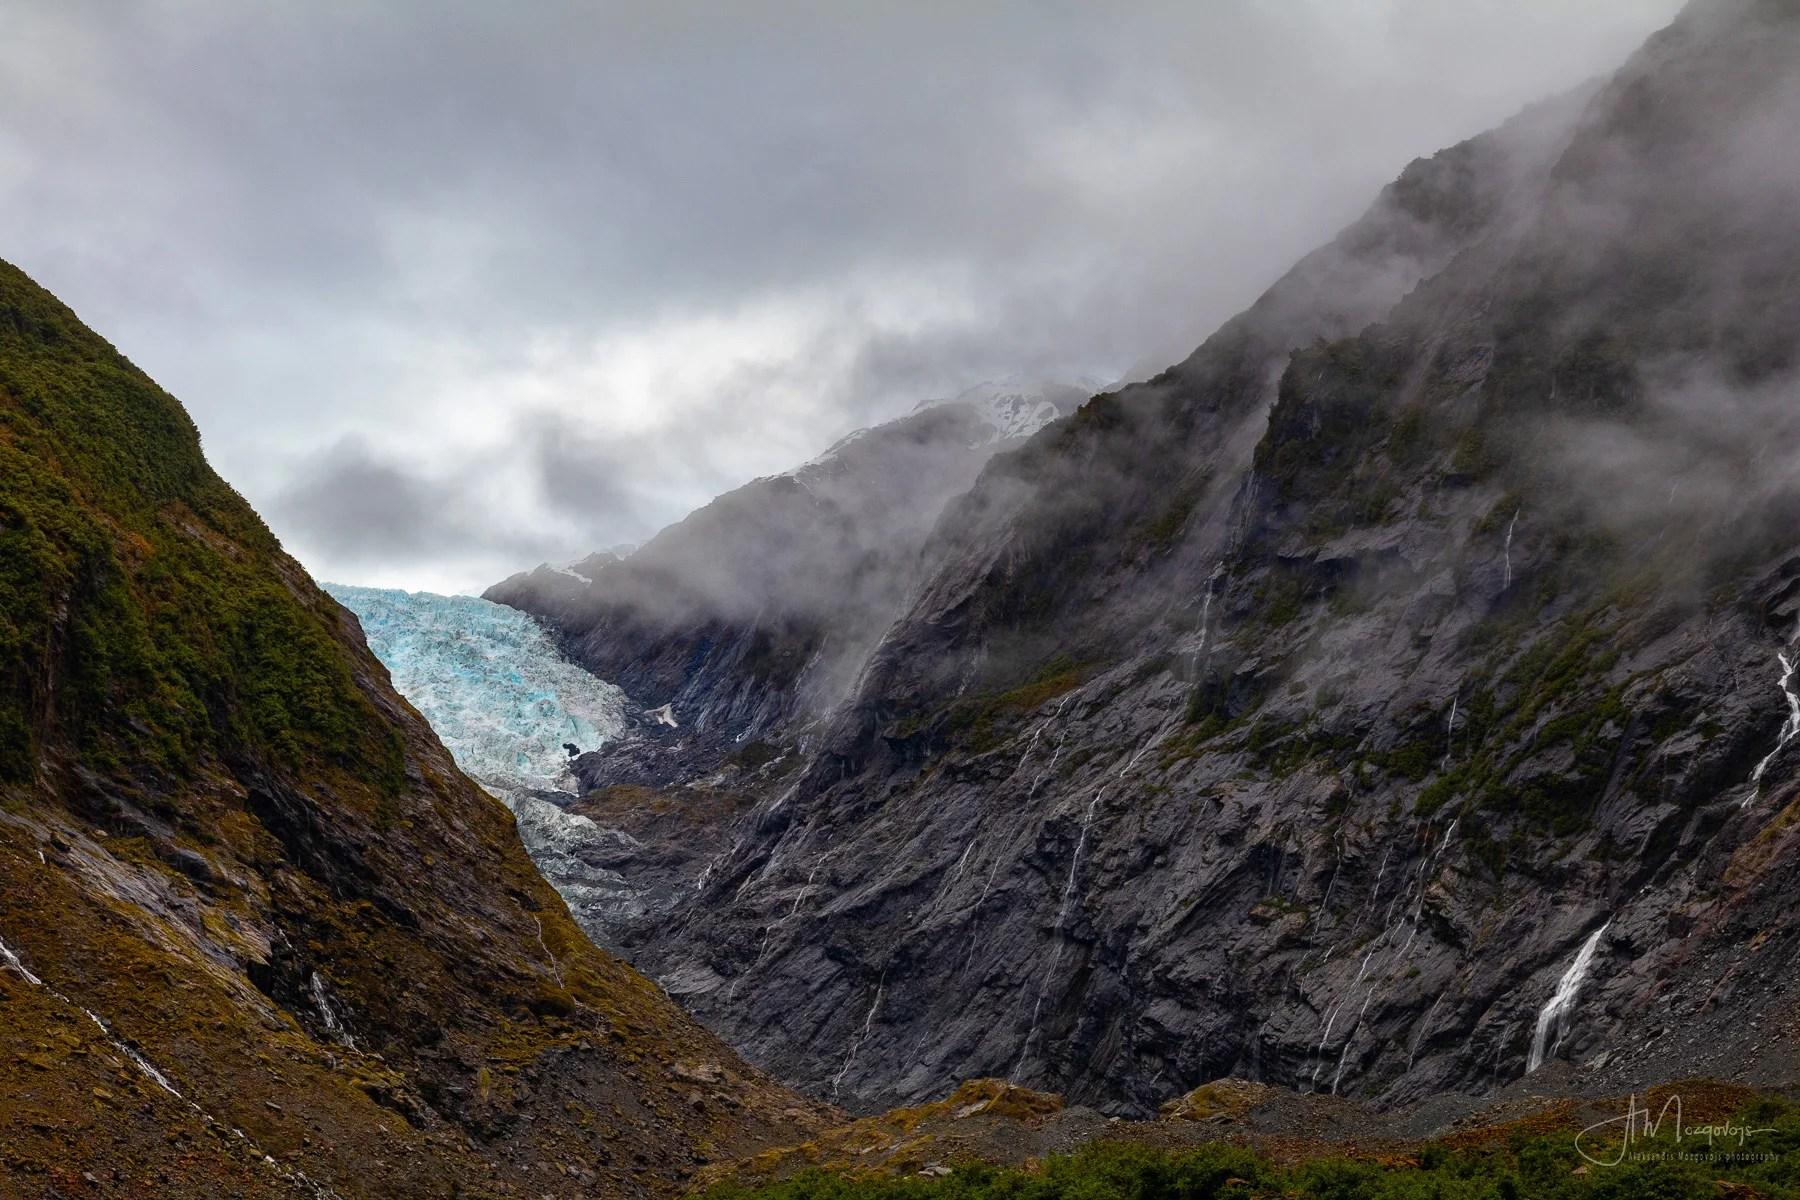 Franz Josef Glacier on a rainy day